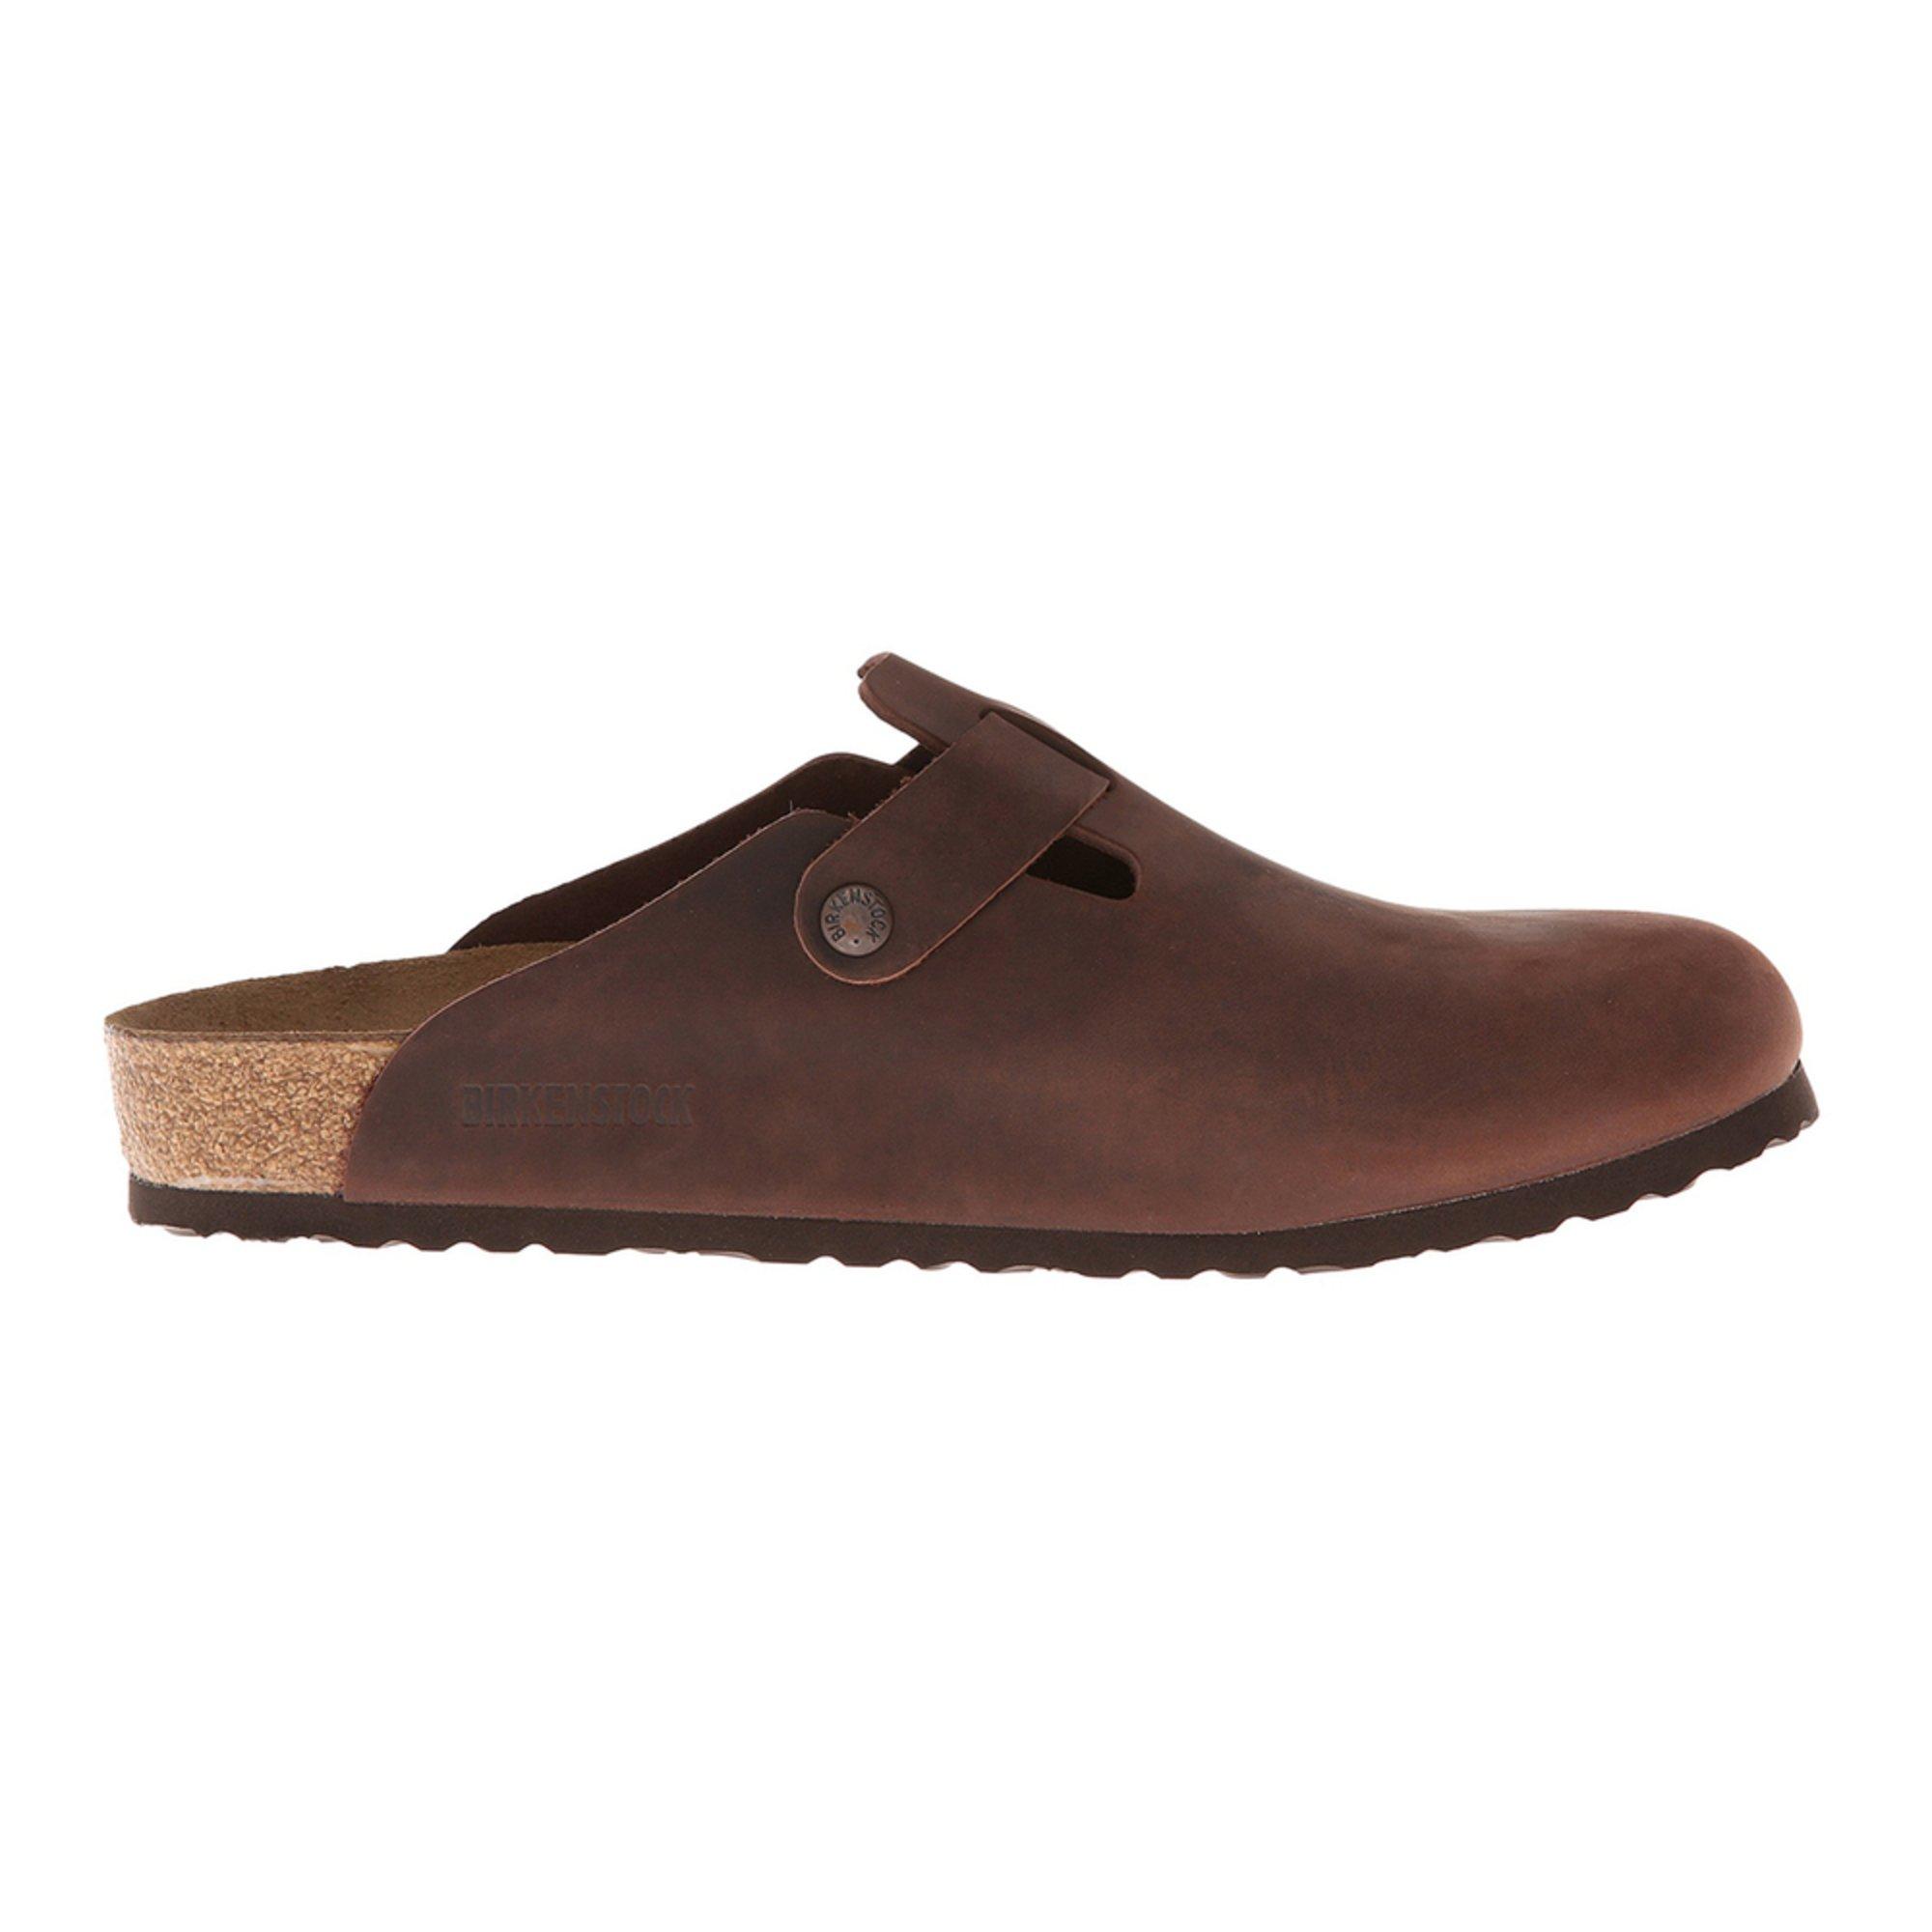 66604e89388e3 Birkenstock Women's Boston Clog | Women's Flats | Shoes - Shop Your ...